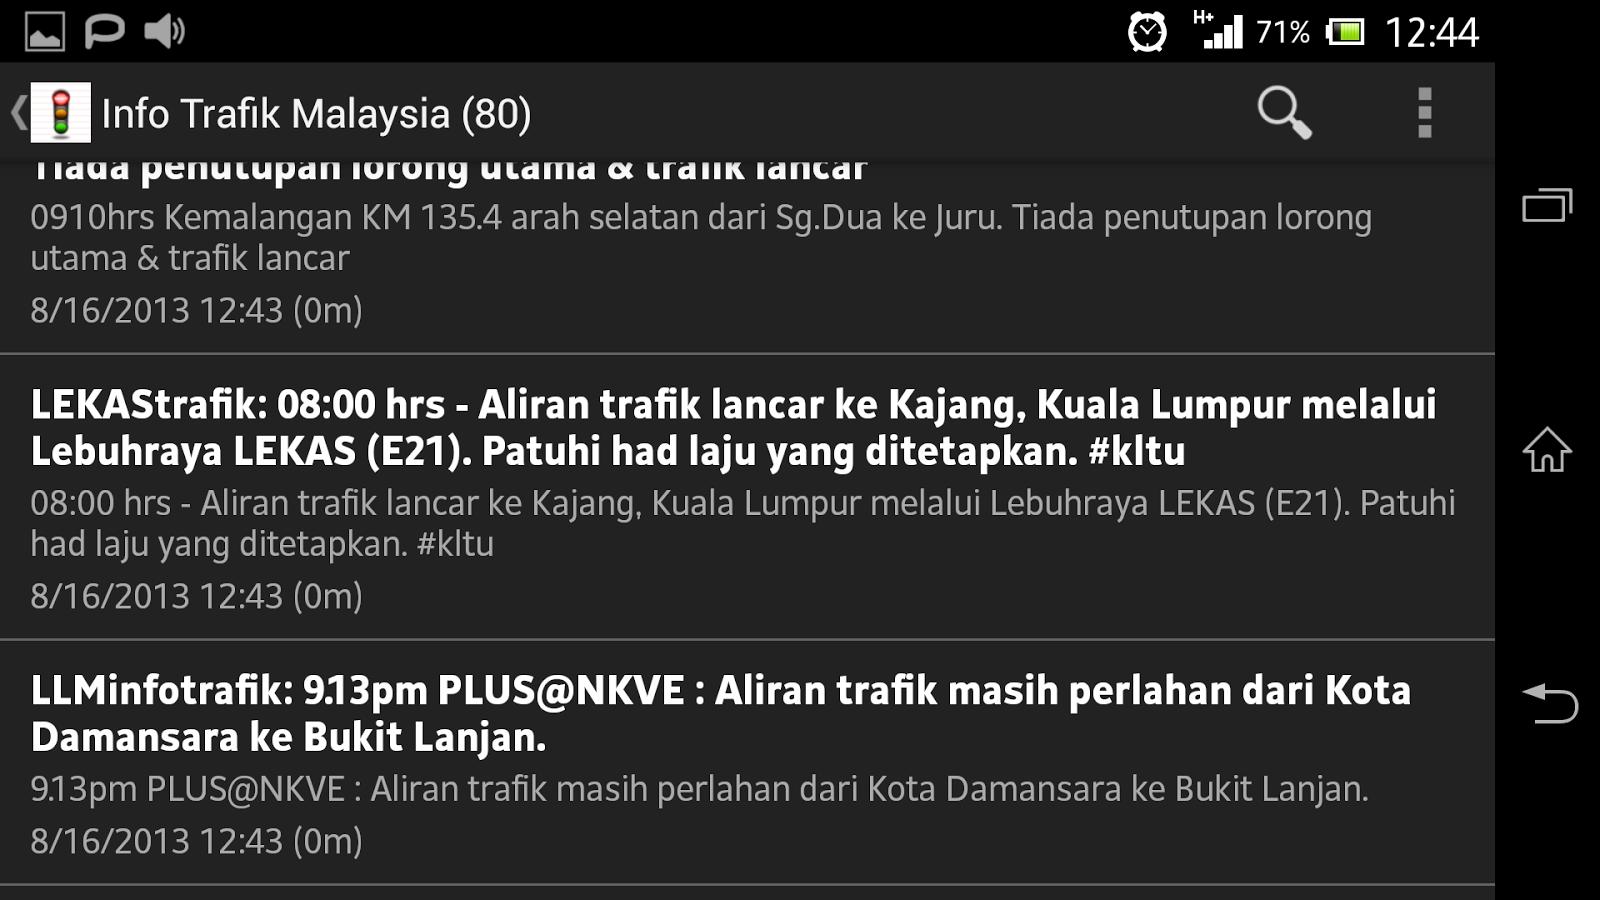 Trafik Malaysia Traffic - screenshot